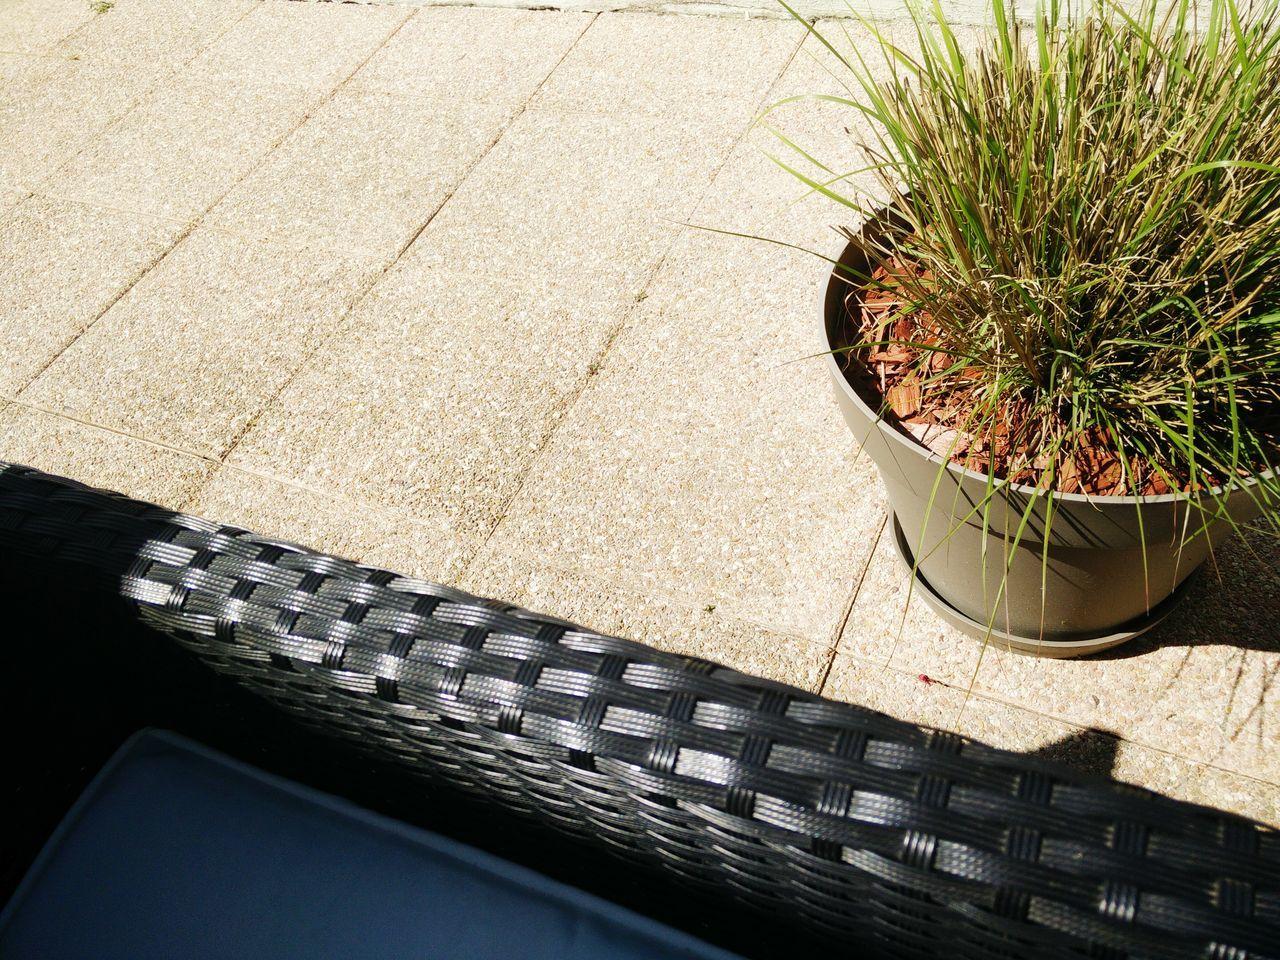 Close-Up Of Pot Plant On Flooring